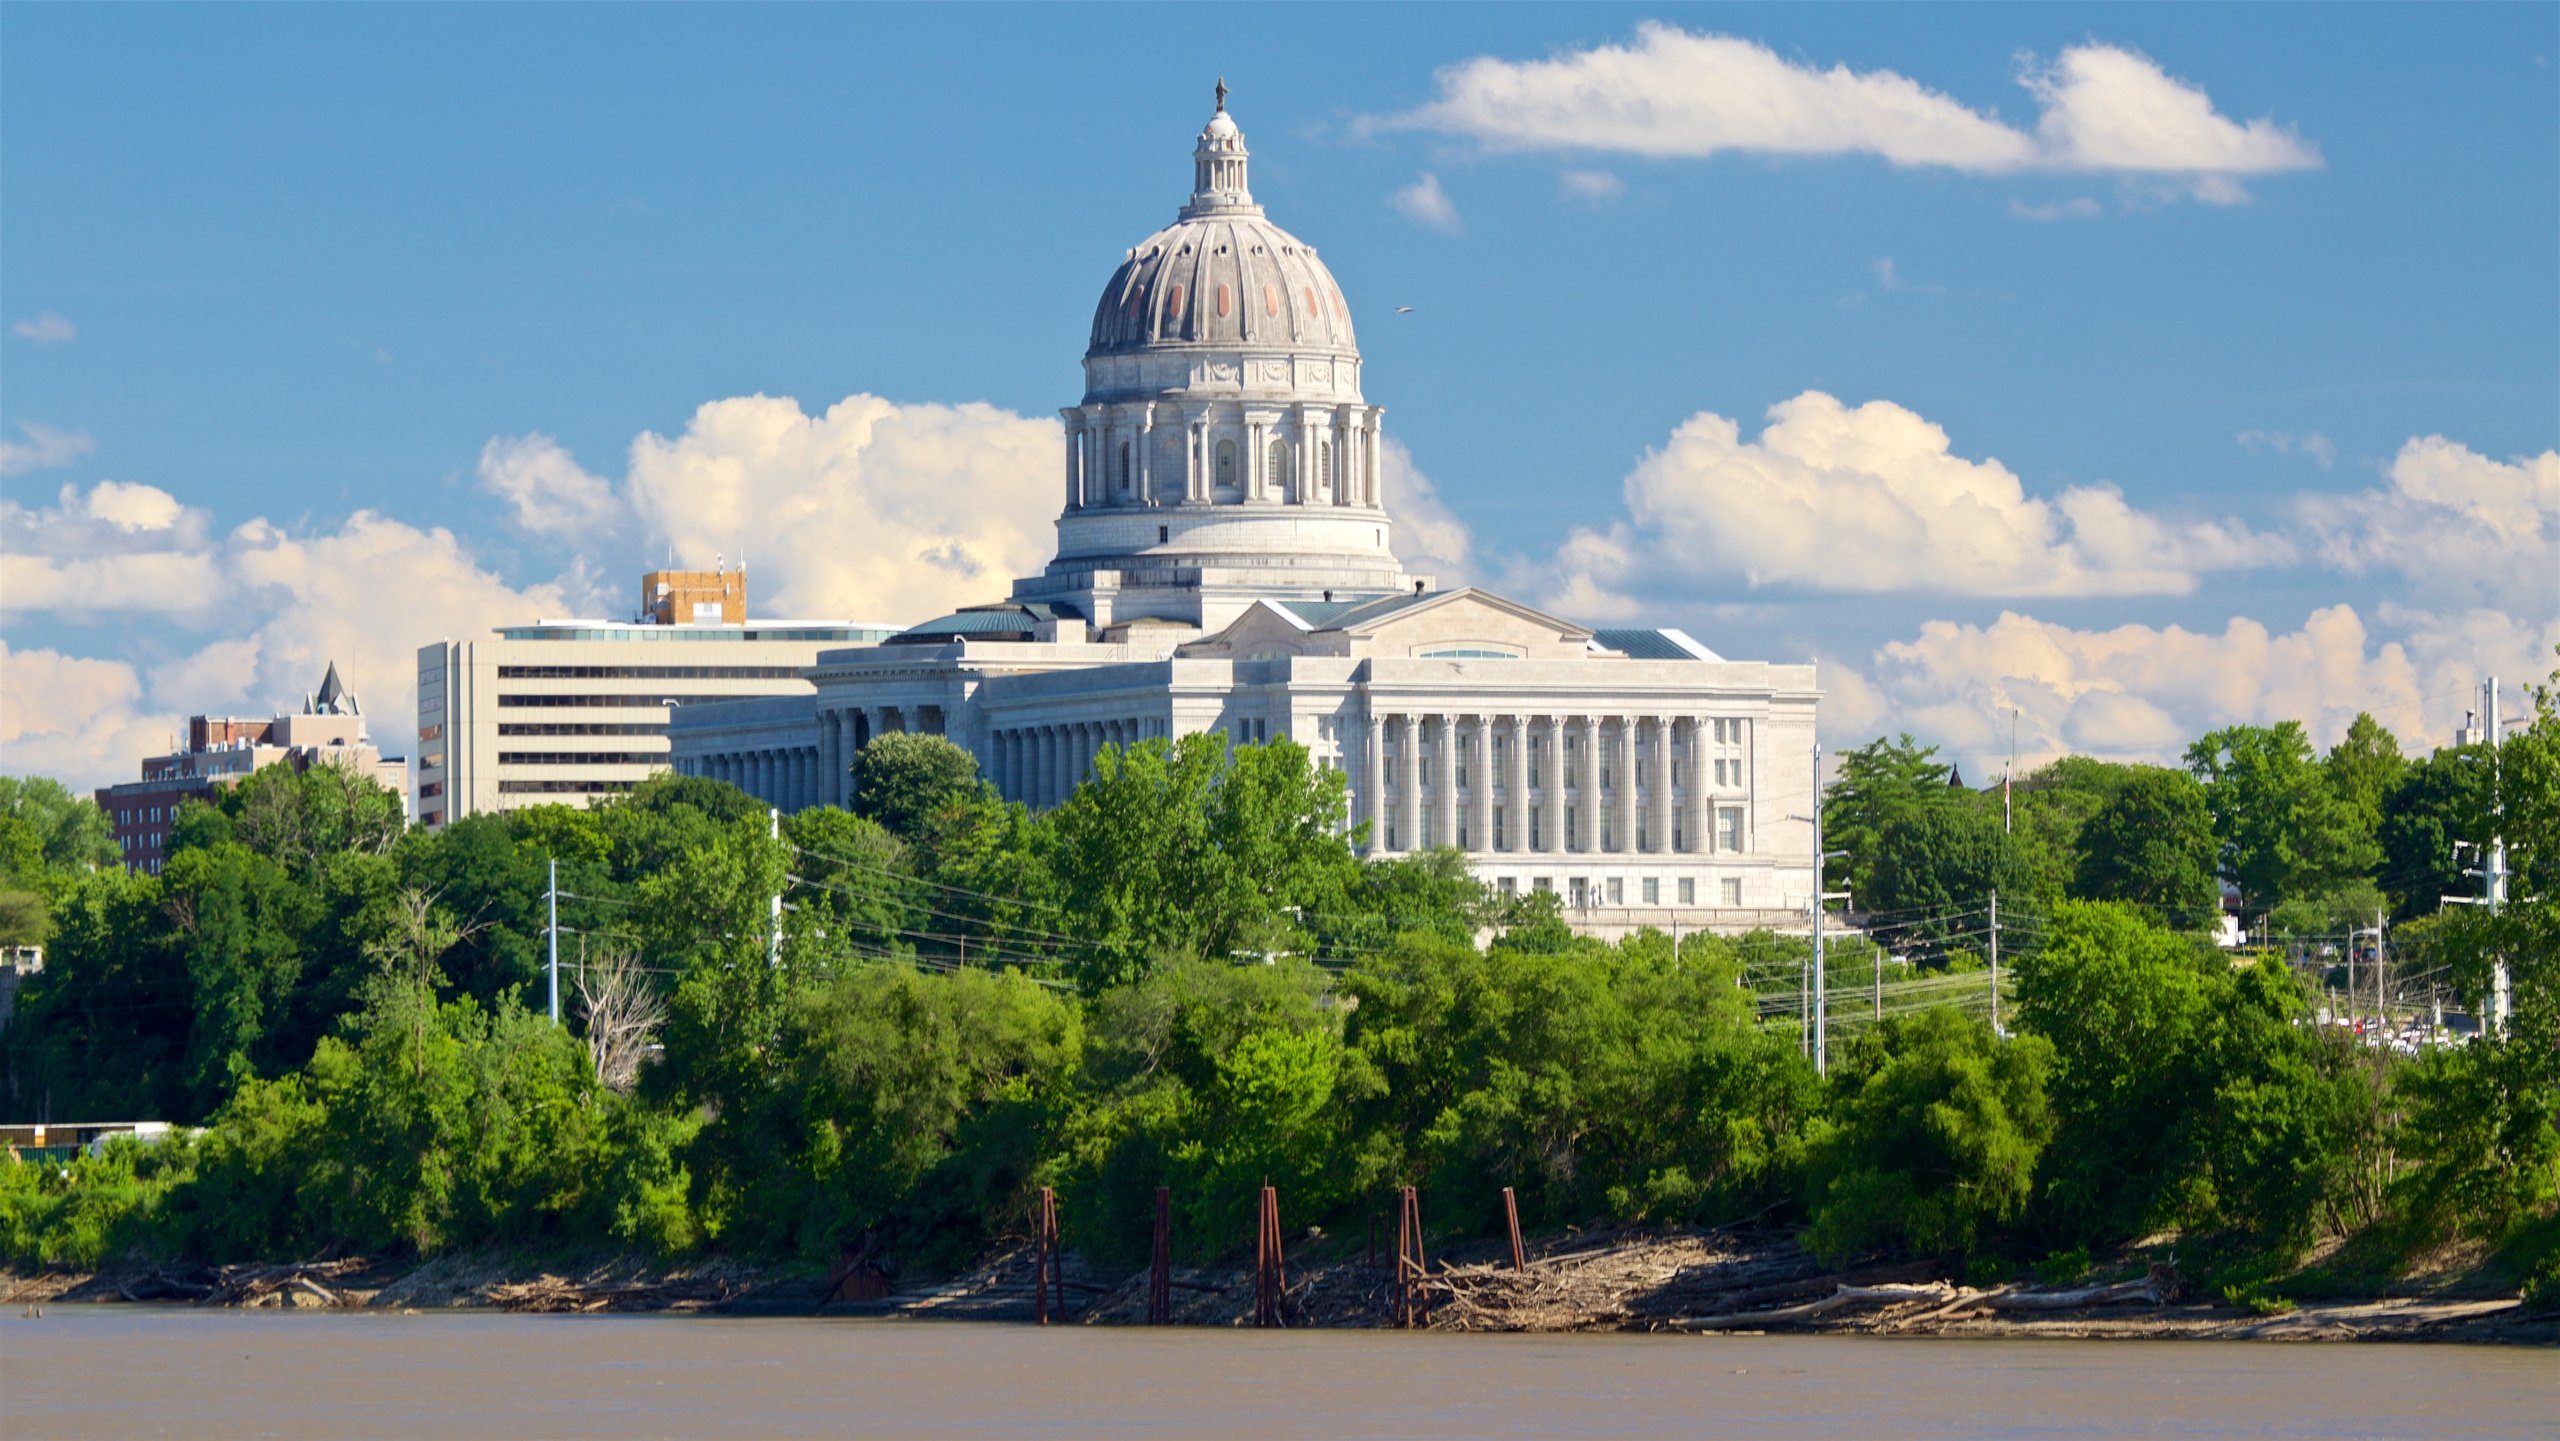 West Virginia, United States of America